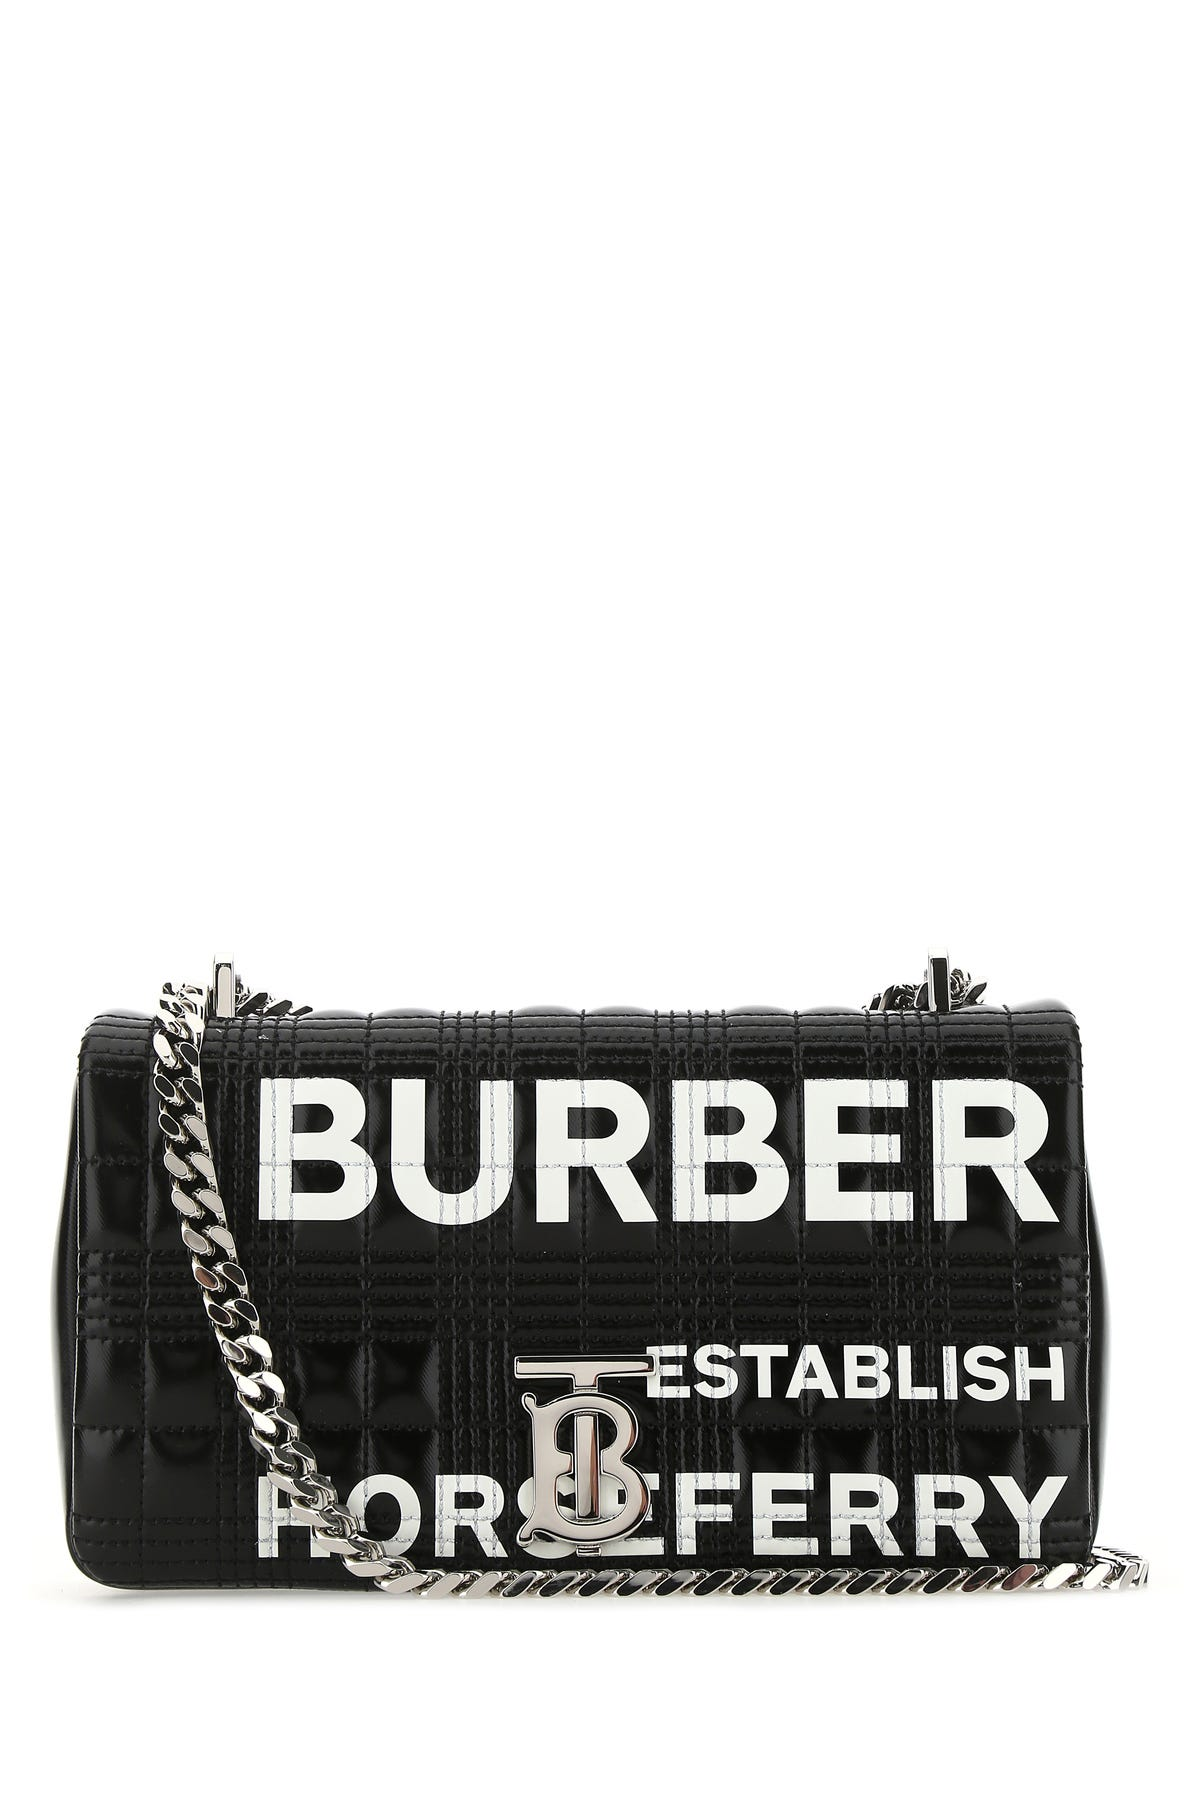 Burberry Borsa-tu